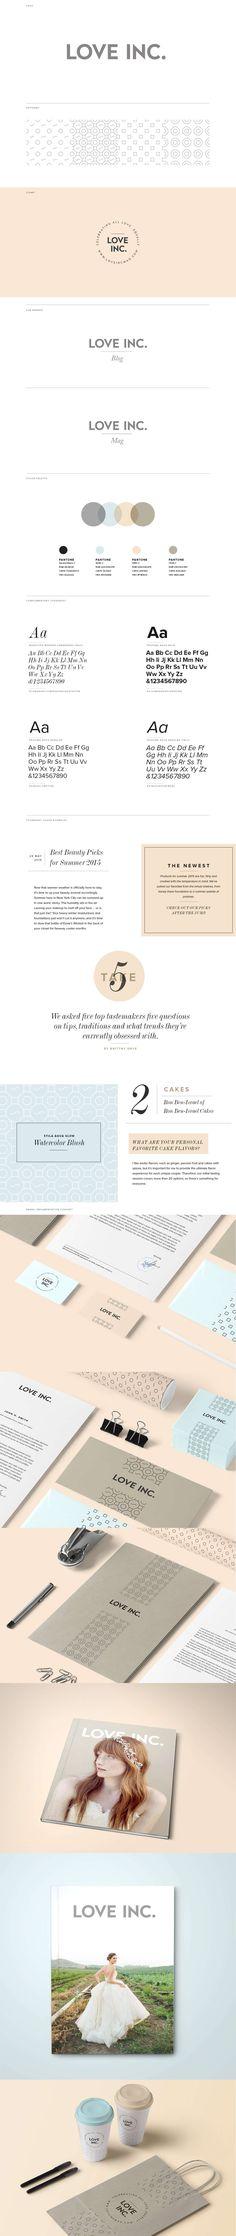 Brand Identity and Site Design for Love Inc. Magazine Branding and Blog Directory. #floagency #branding #interactivedesign #digital #print #brandidentity